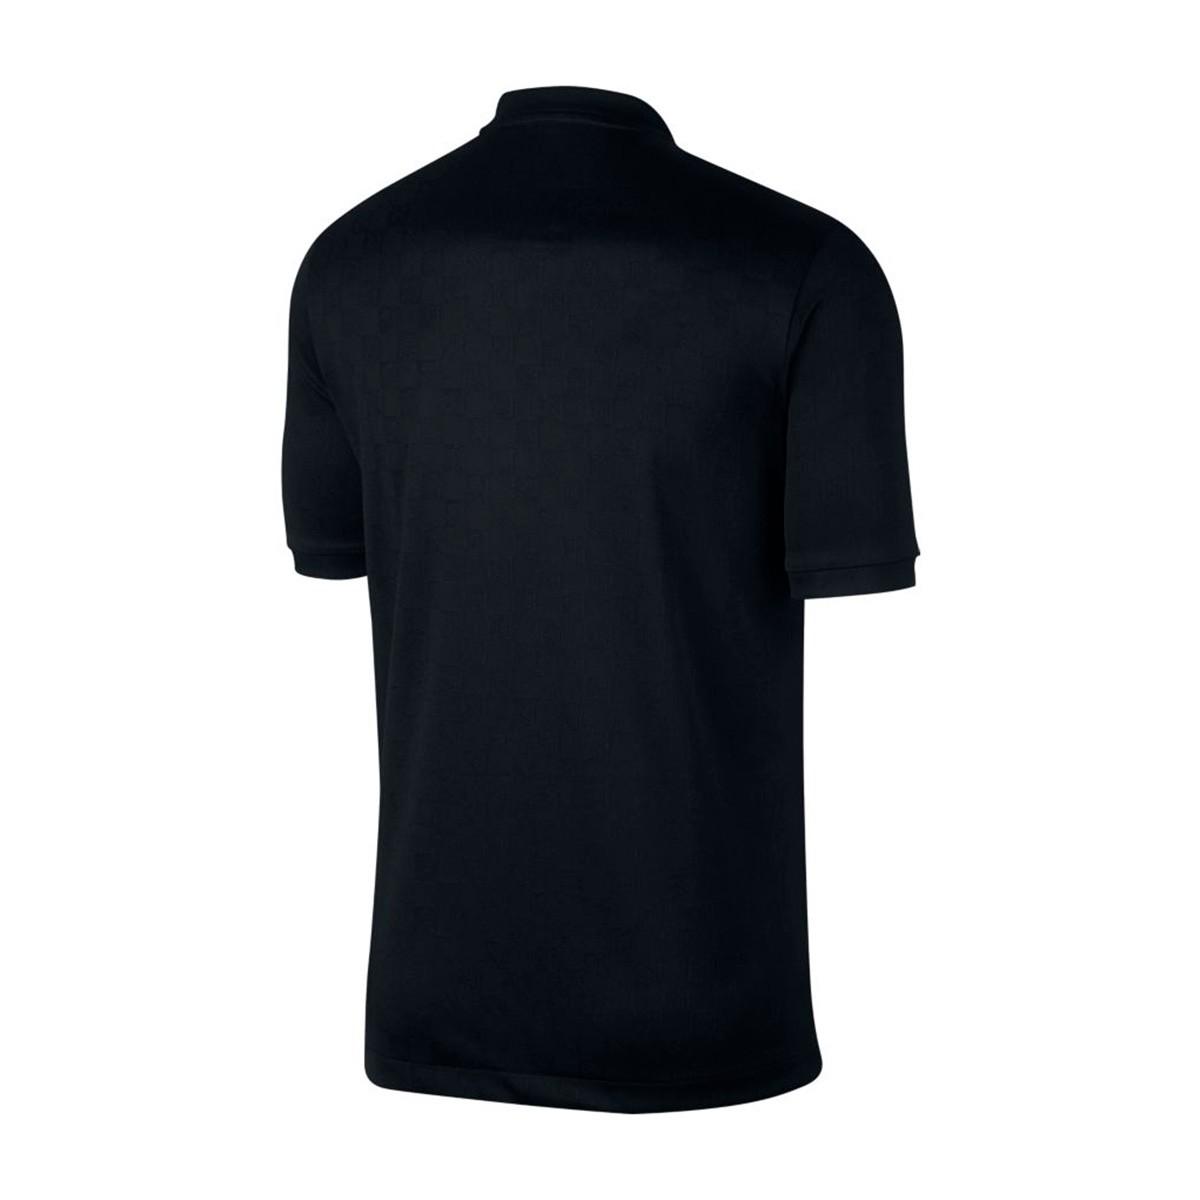 64151d329edd Jersey Nike Nike F.C. Black-University red - Football store Fútbol ...